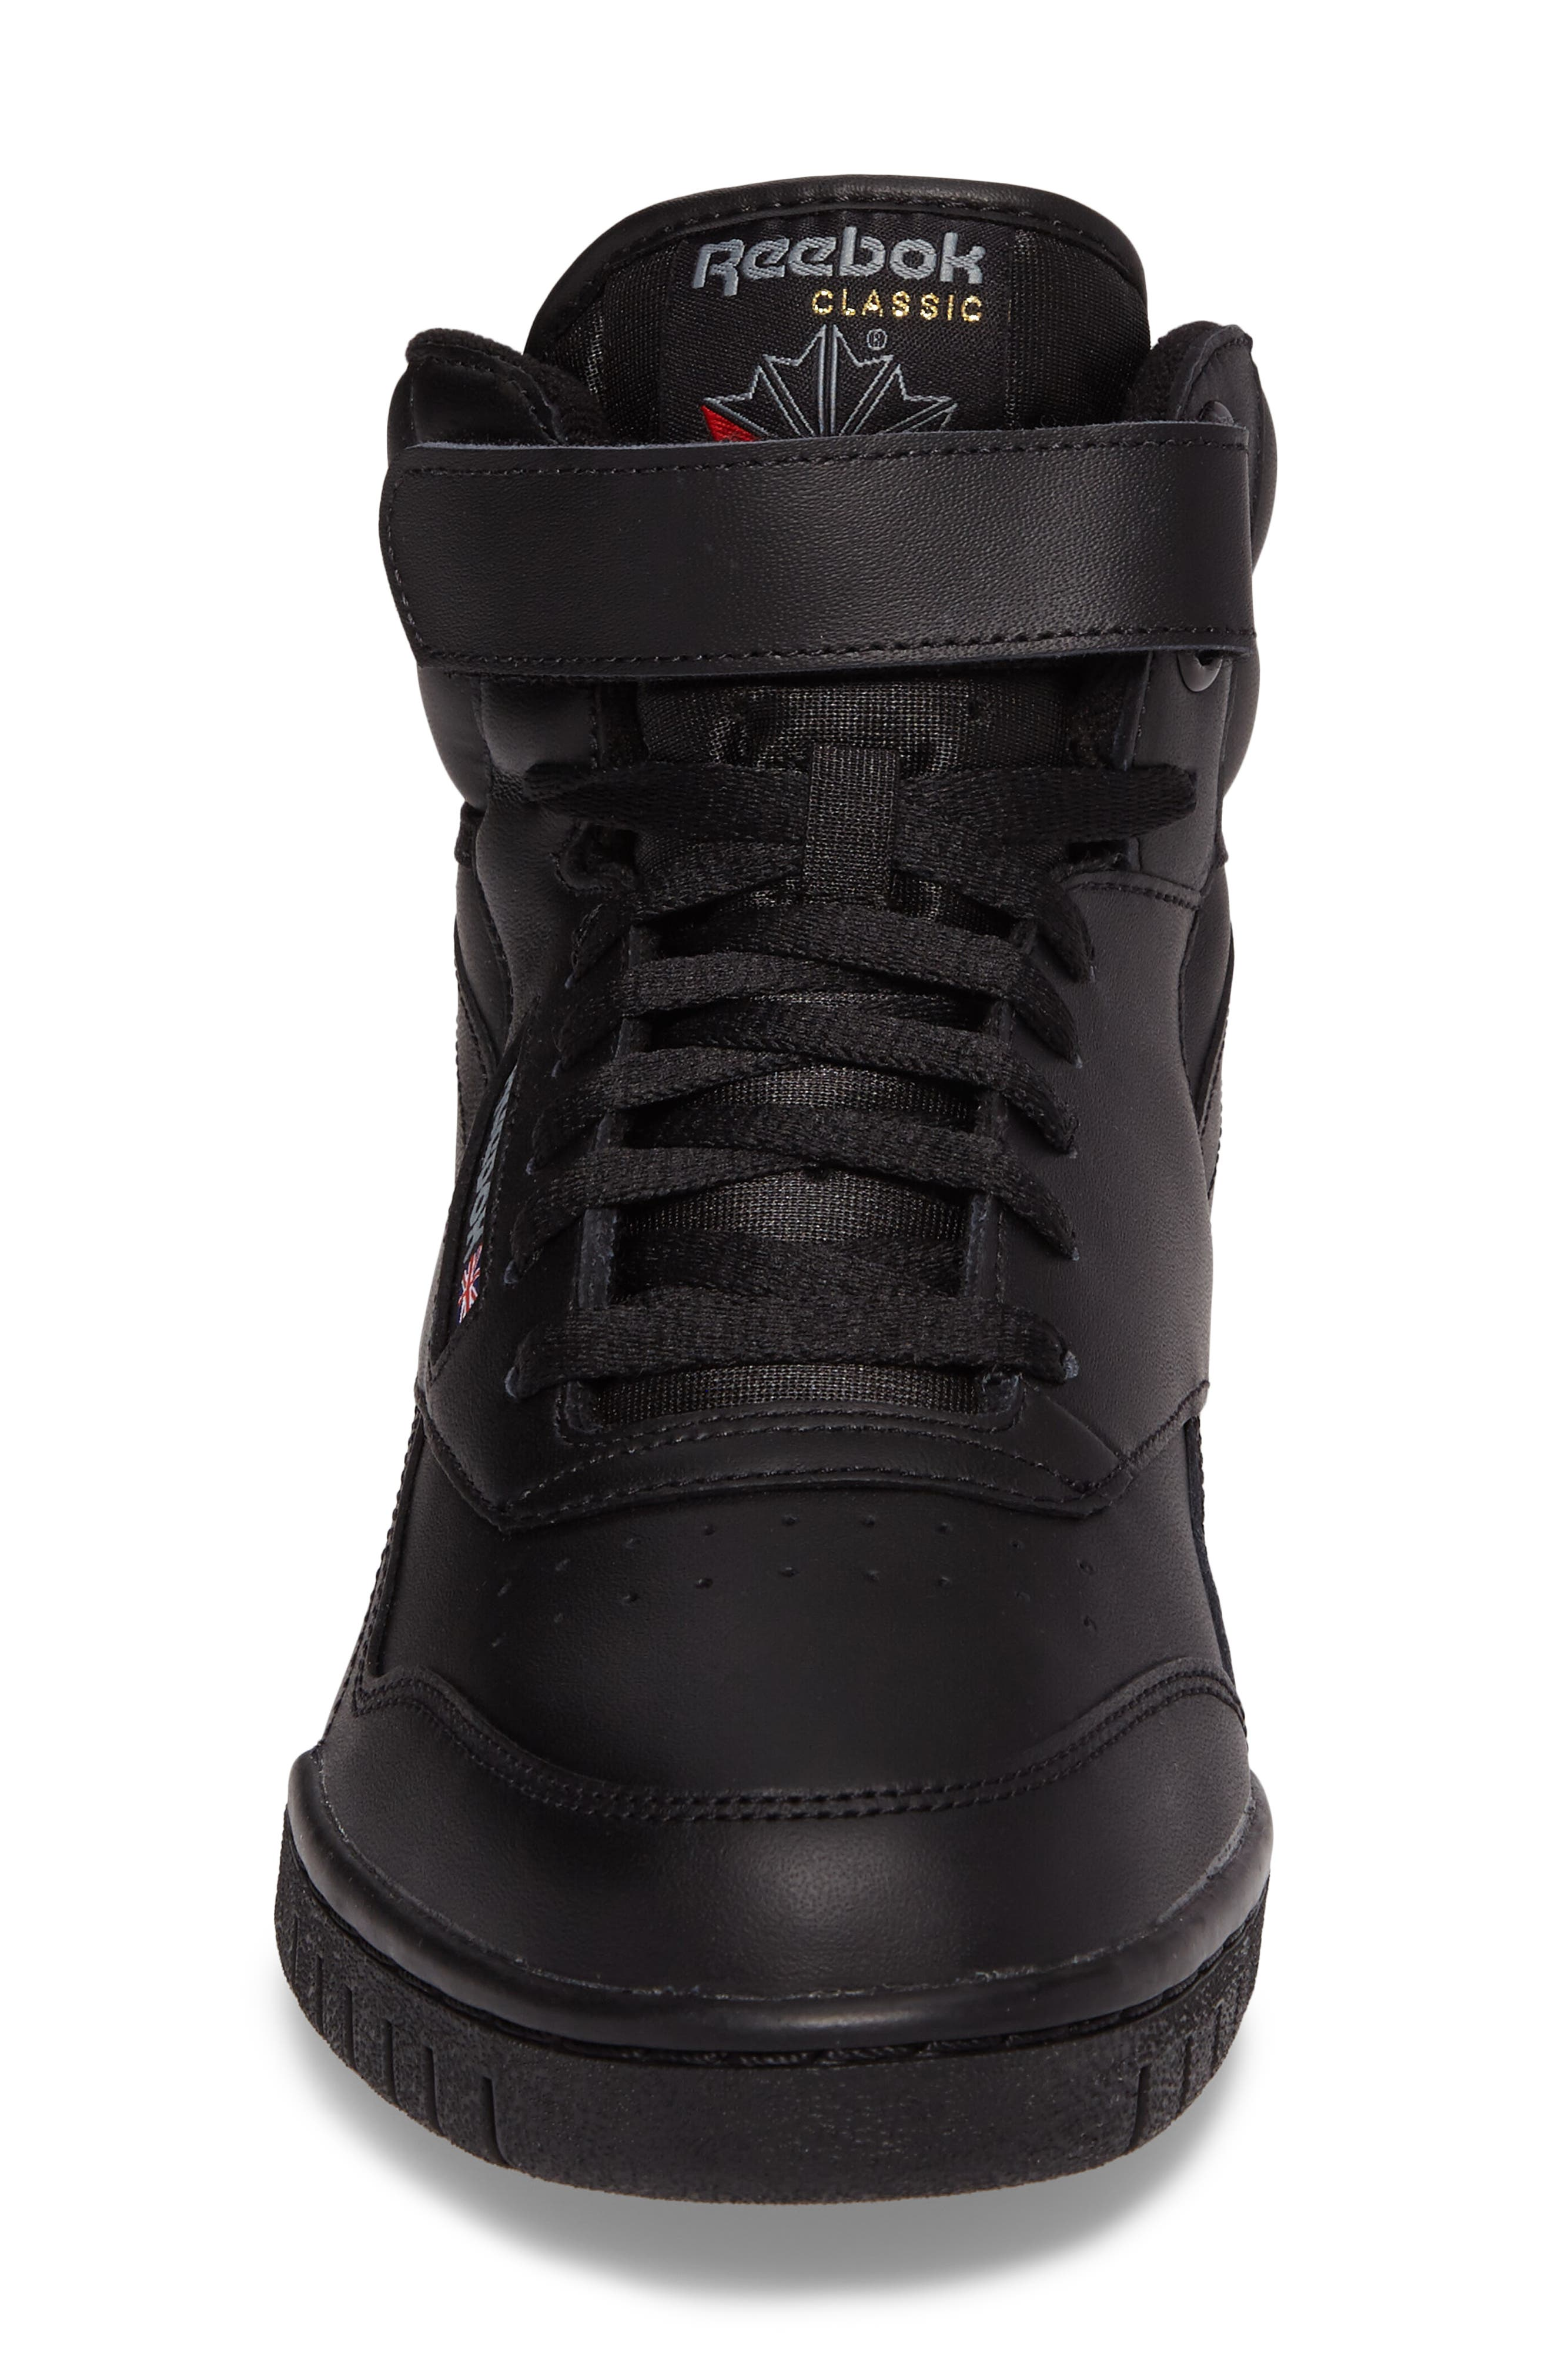 Ex-O-Fit Hi Sneaker,                             Alternate thumbnail 4, color,                             Black